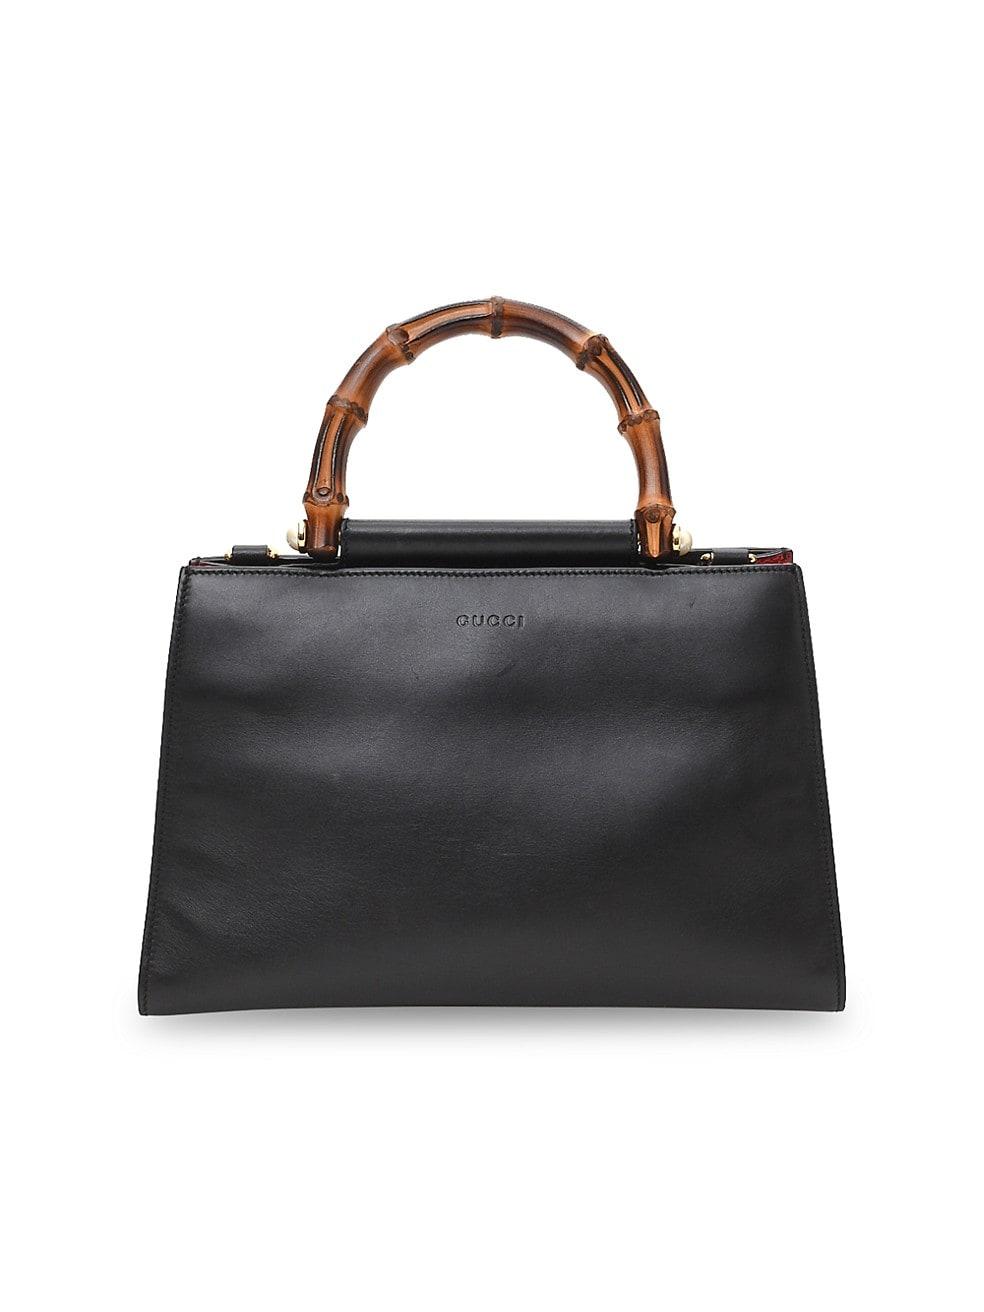 SAKS OFF 5TH: Vintage Luxury Handbags Up to 70% off